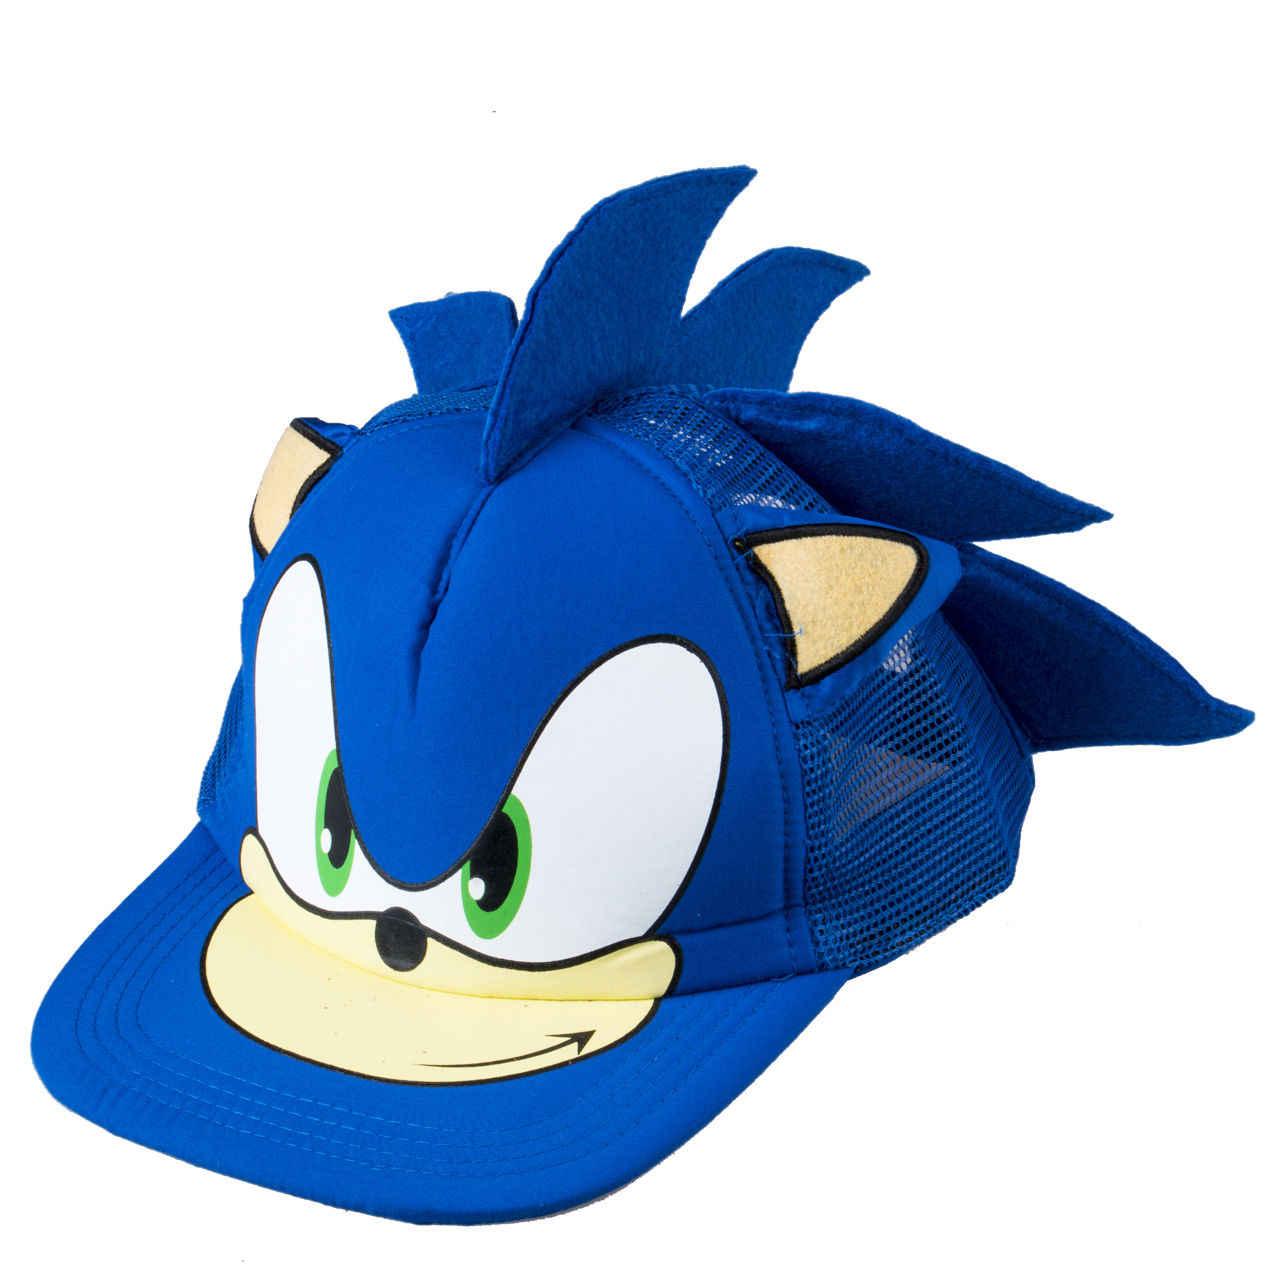 Cute Boy Sonic The Hedgehog Cartoon Youth Adjustable Baseball Hat Cap Blue For Boys Hot Selling Baseball Hat Cap The Cap Cap Blue Aliexpress